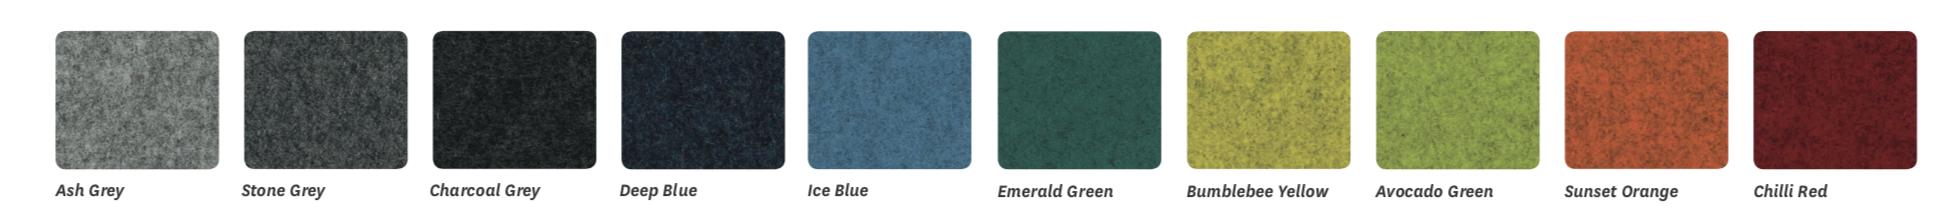 mod-ottoman-fabric-colour.png